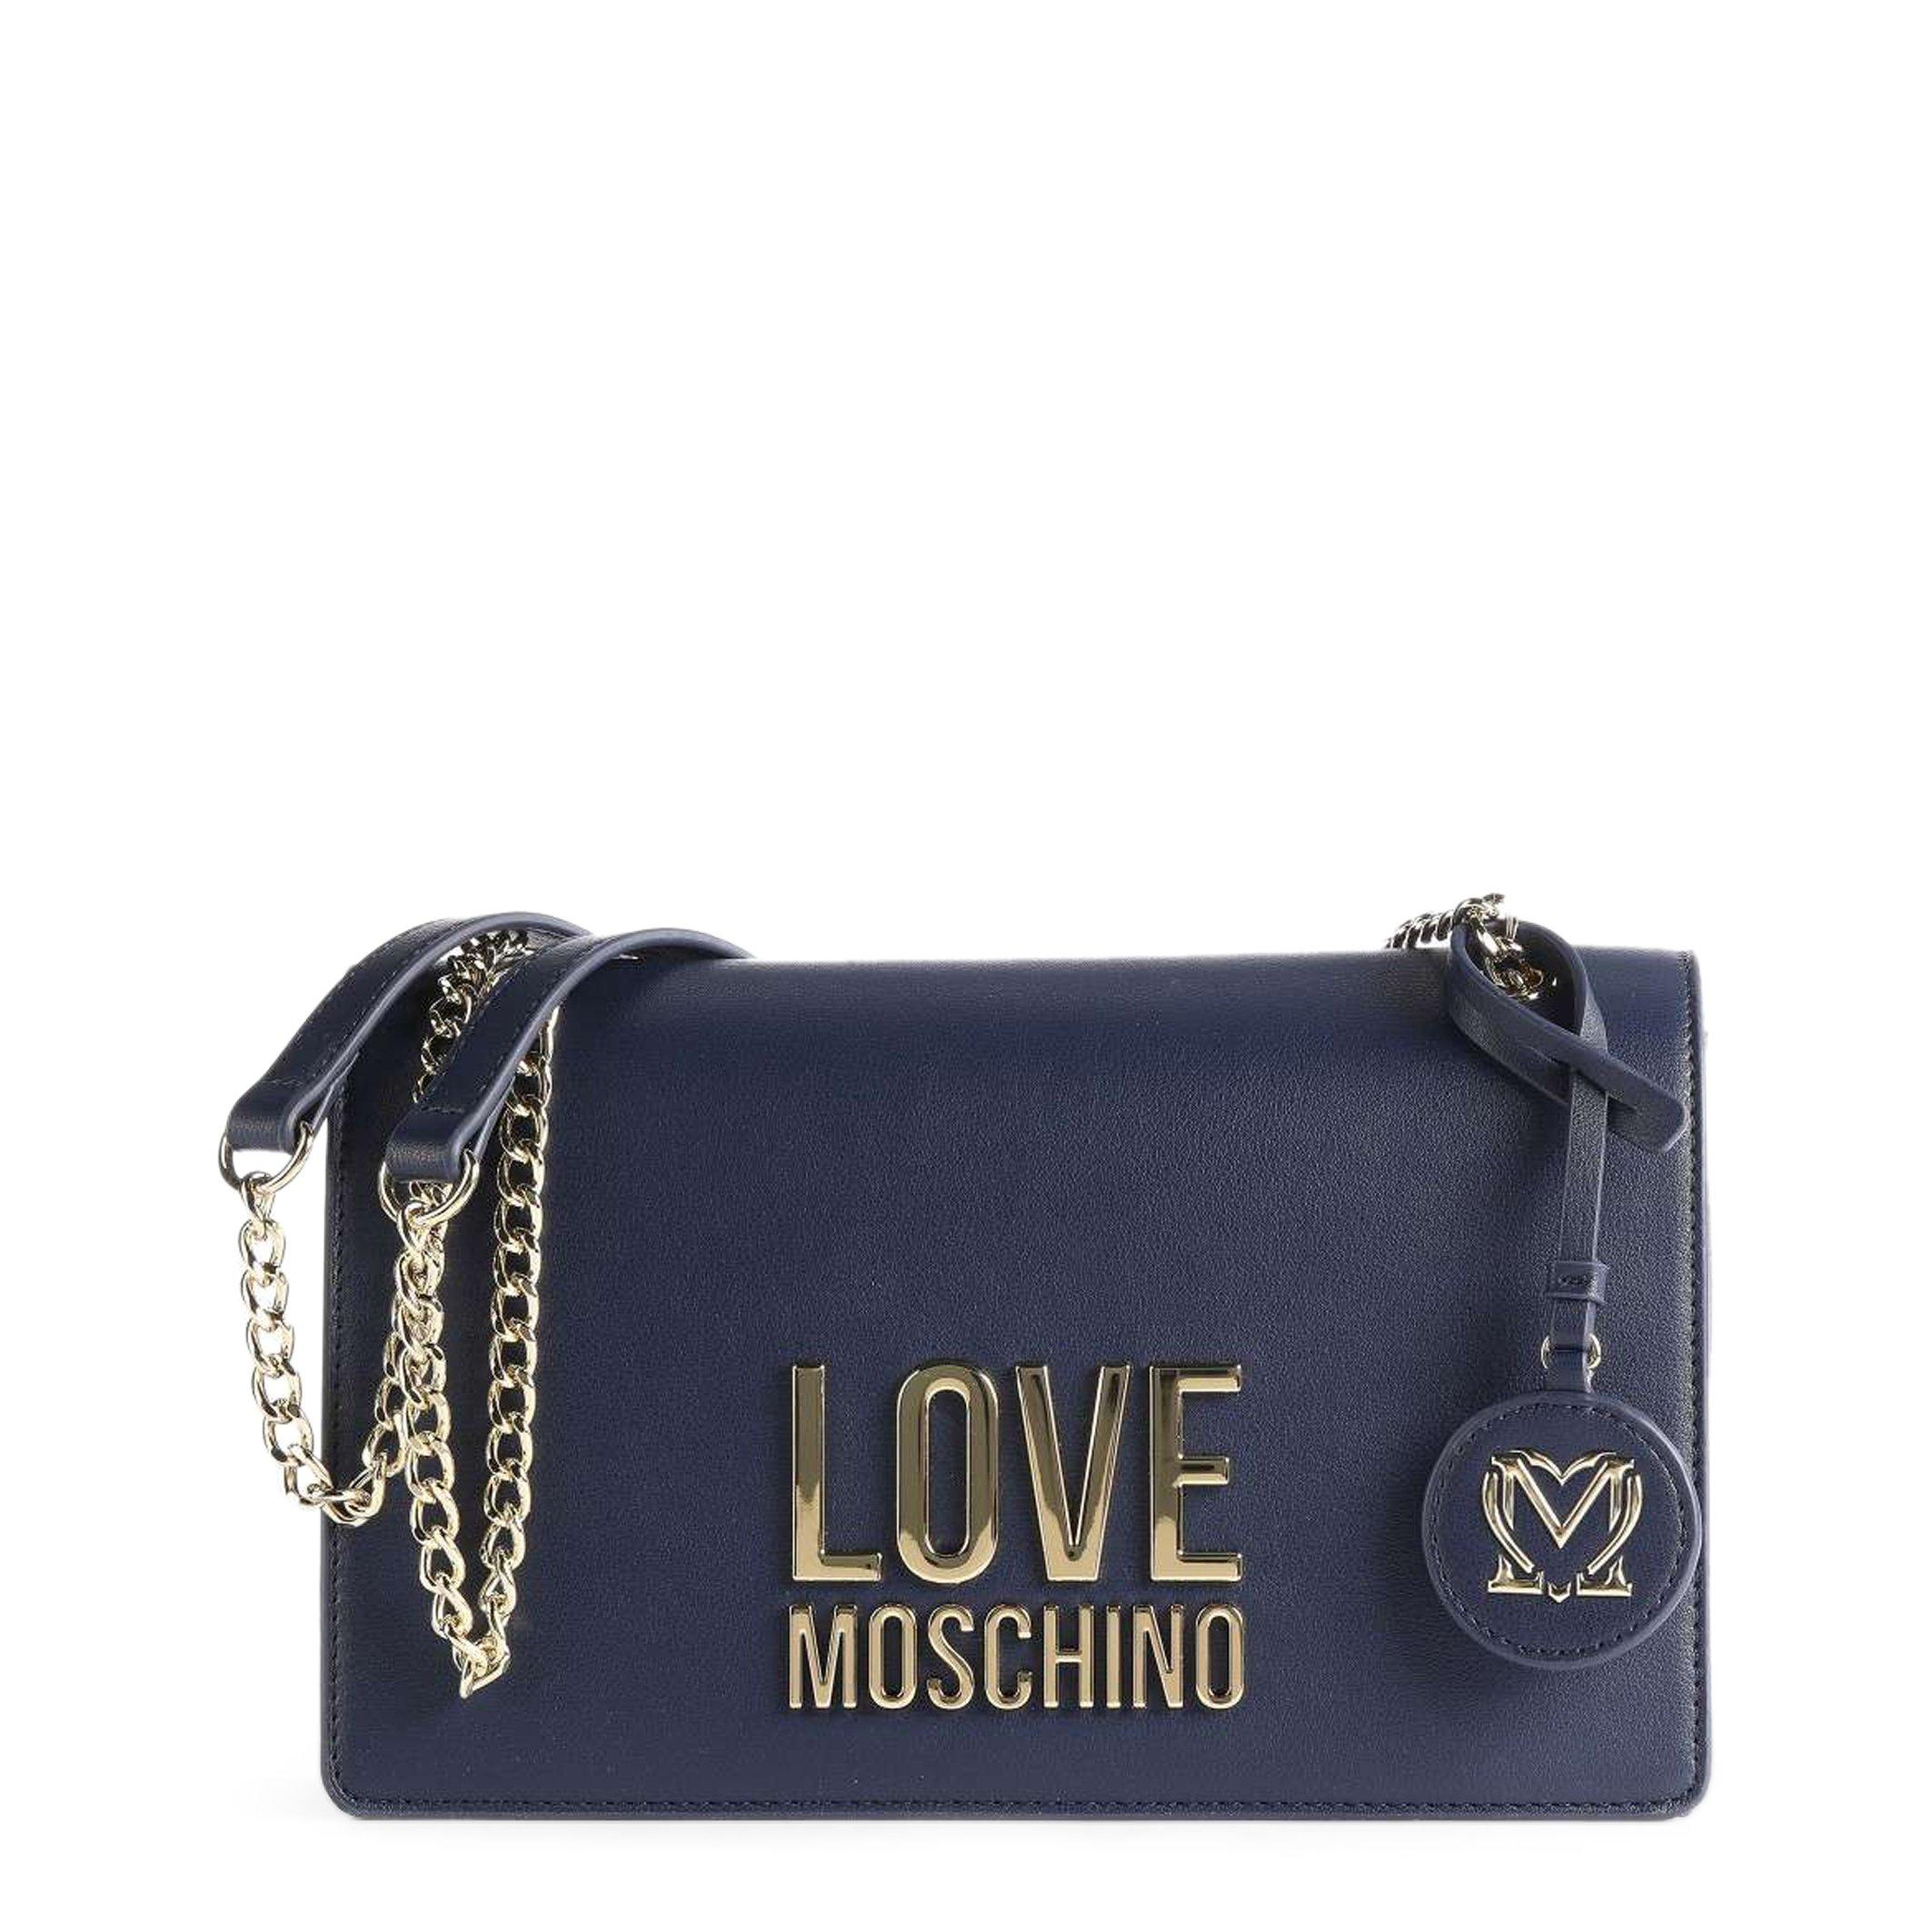 Love Moschino Women's Shoulder Bag Various Colours JC4099PP1DLJ0 - blue NOSIZE